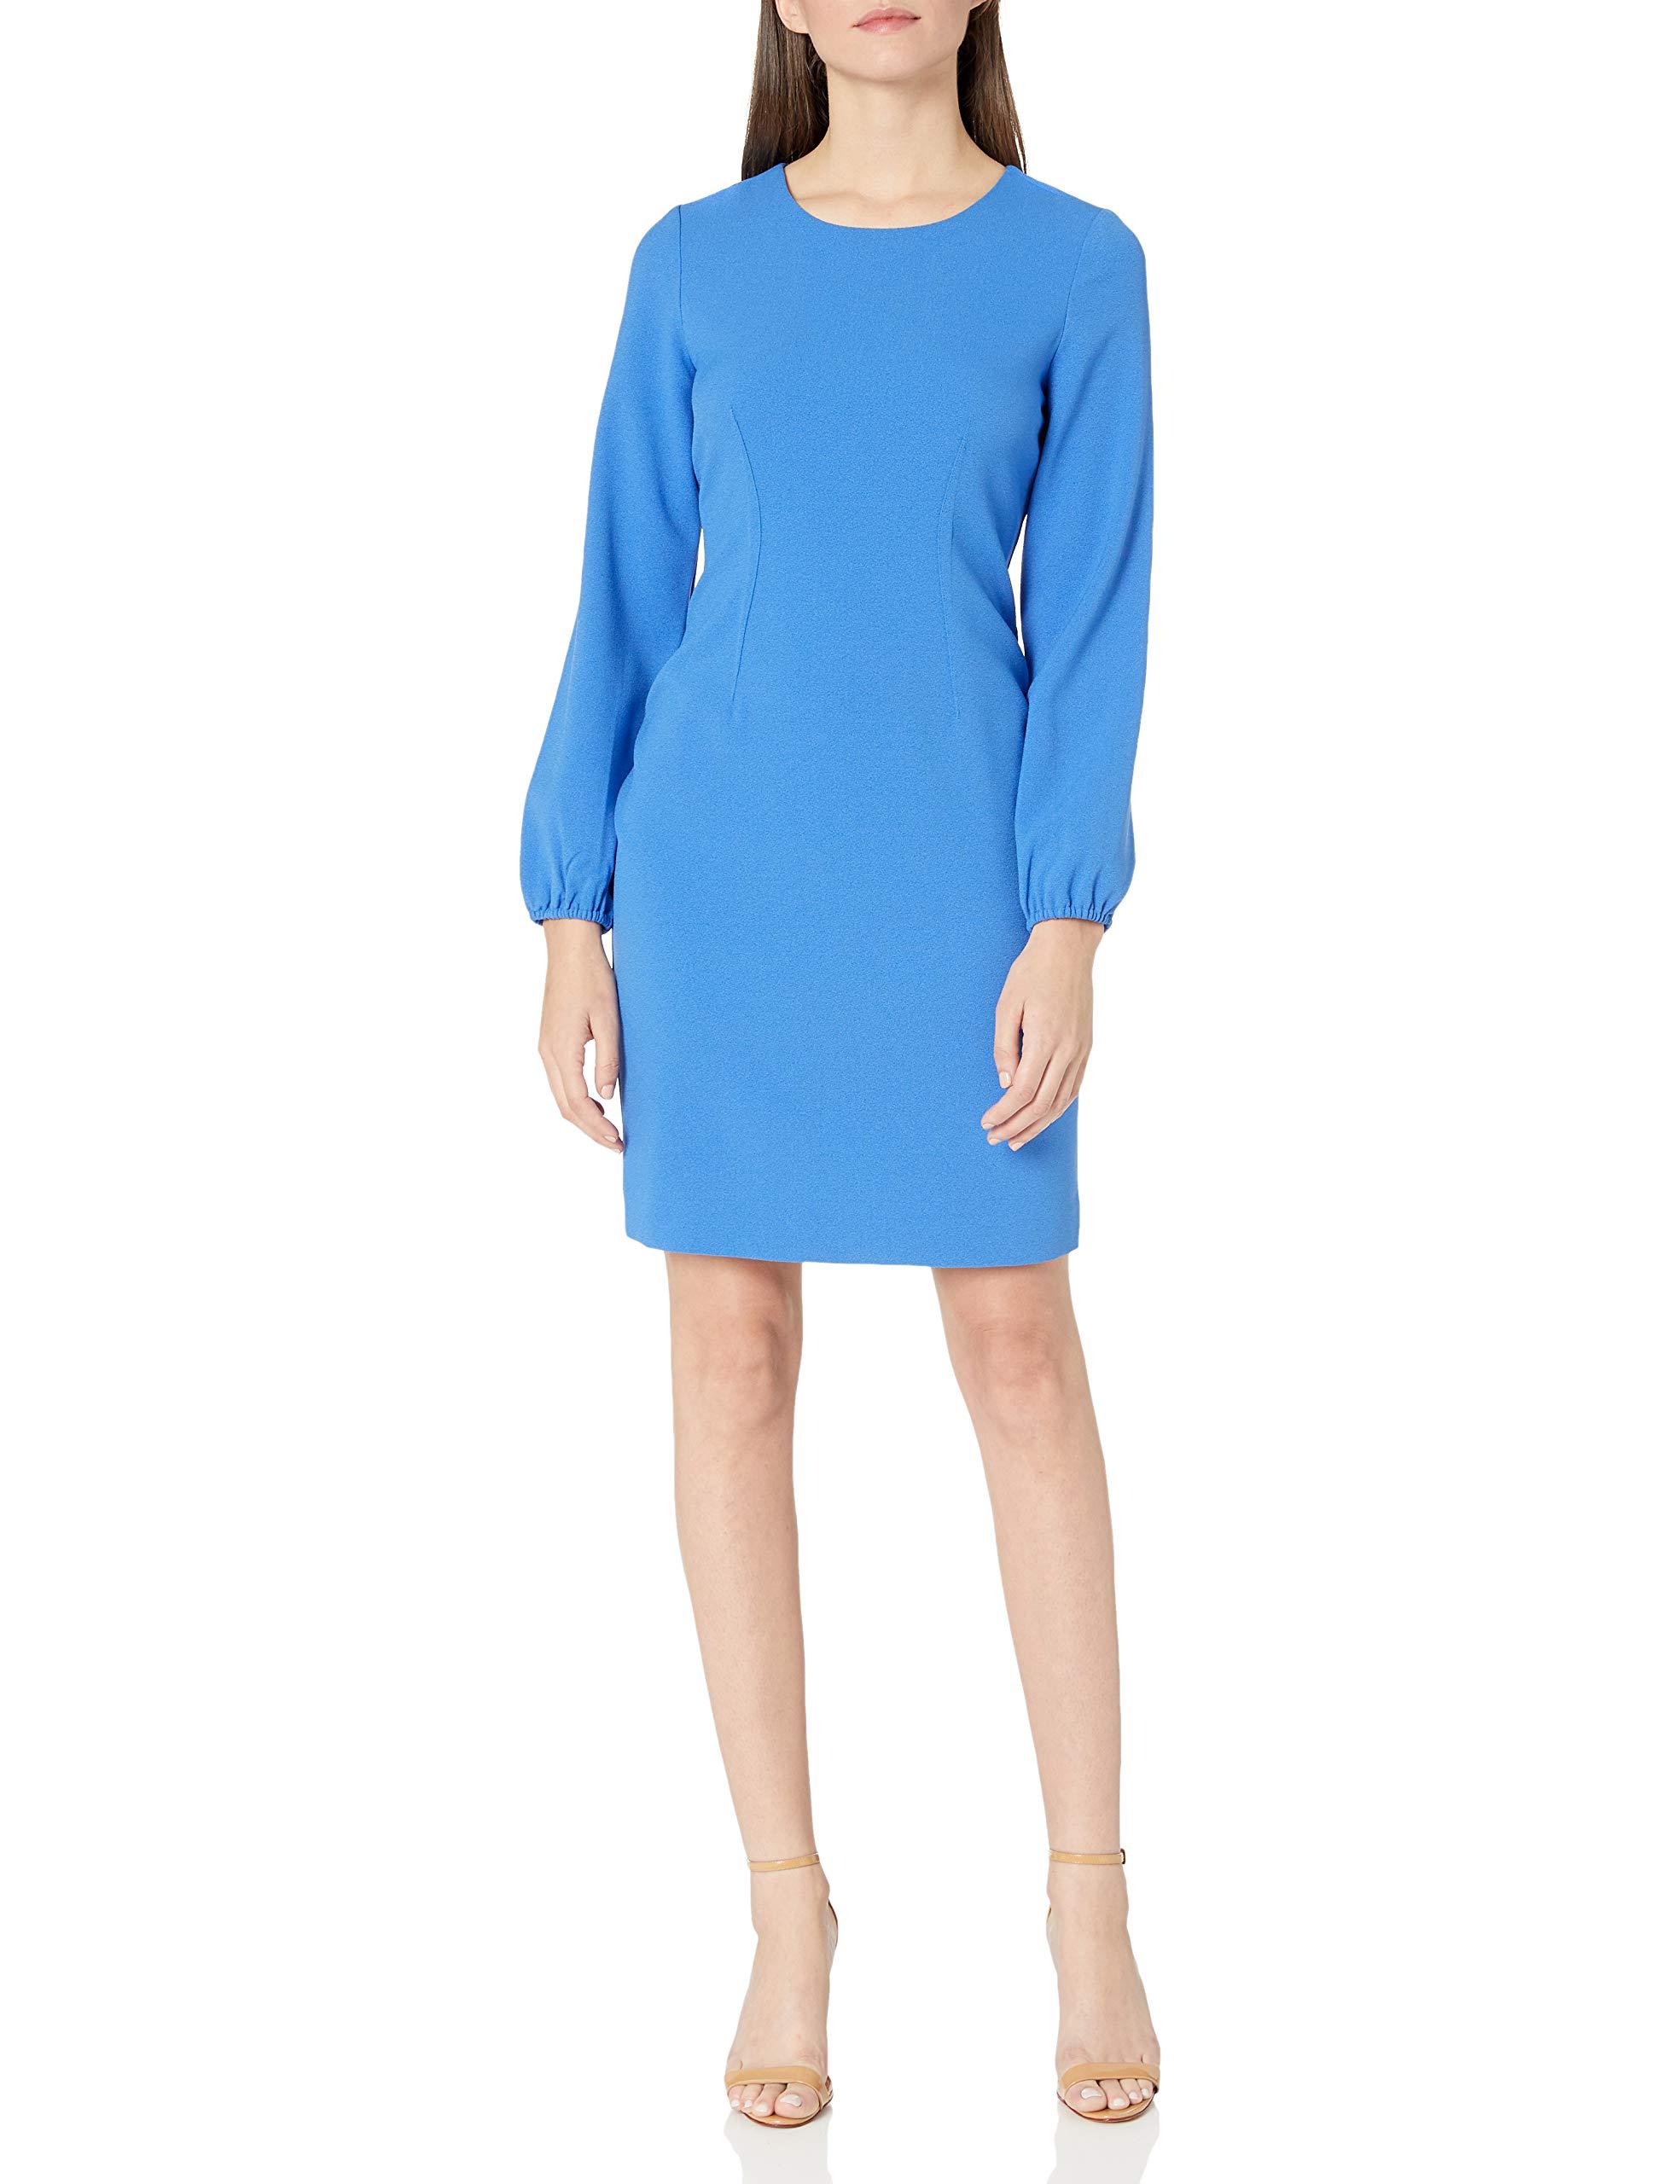 Available at Amazon: NINE WEST Women's Long Sleeve Dart Body Dress